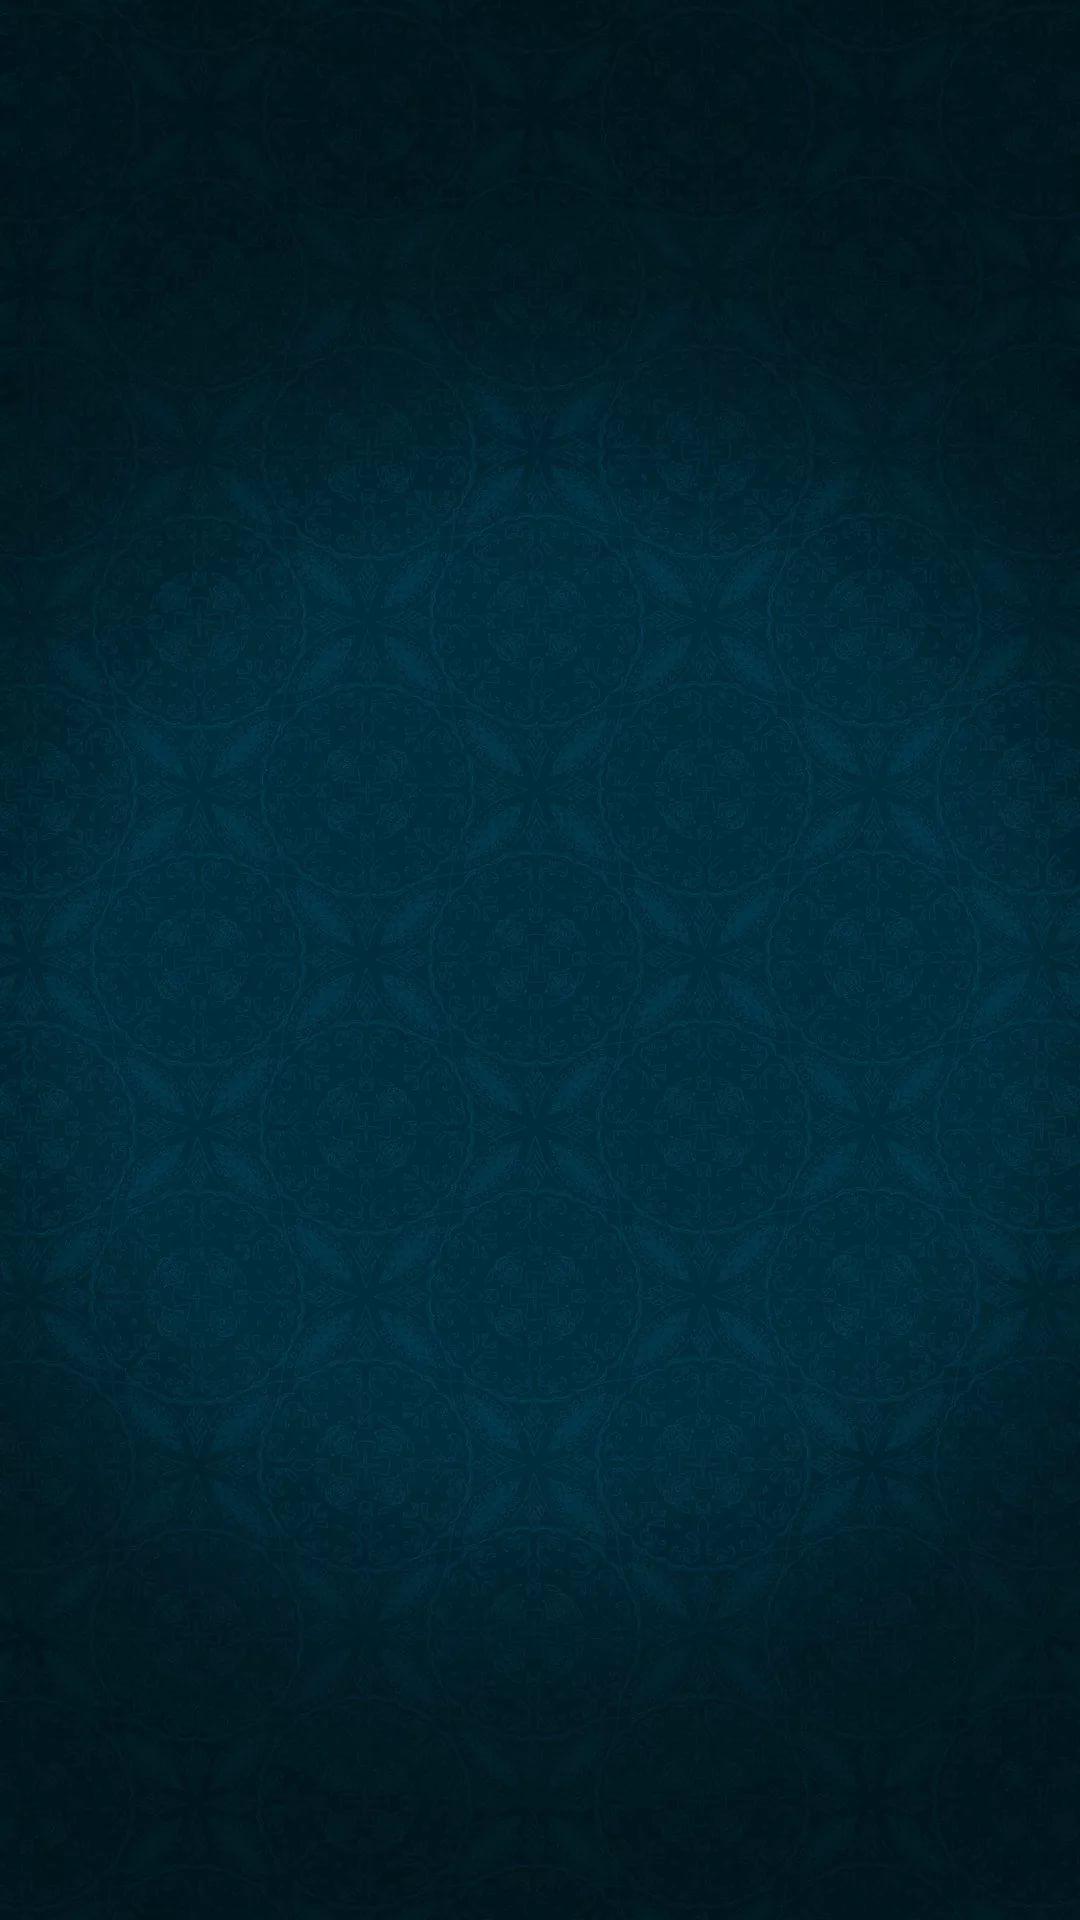 Dark Blue iPhone wallpaper